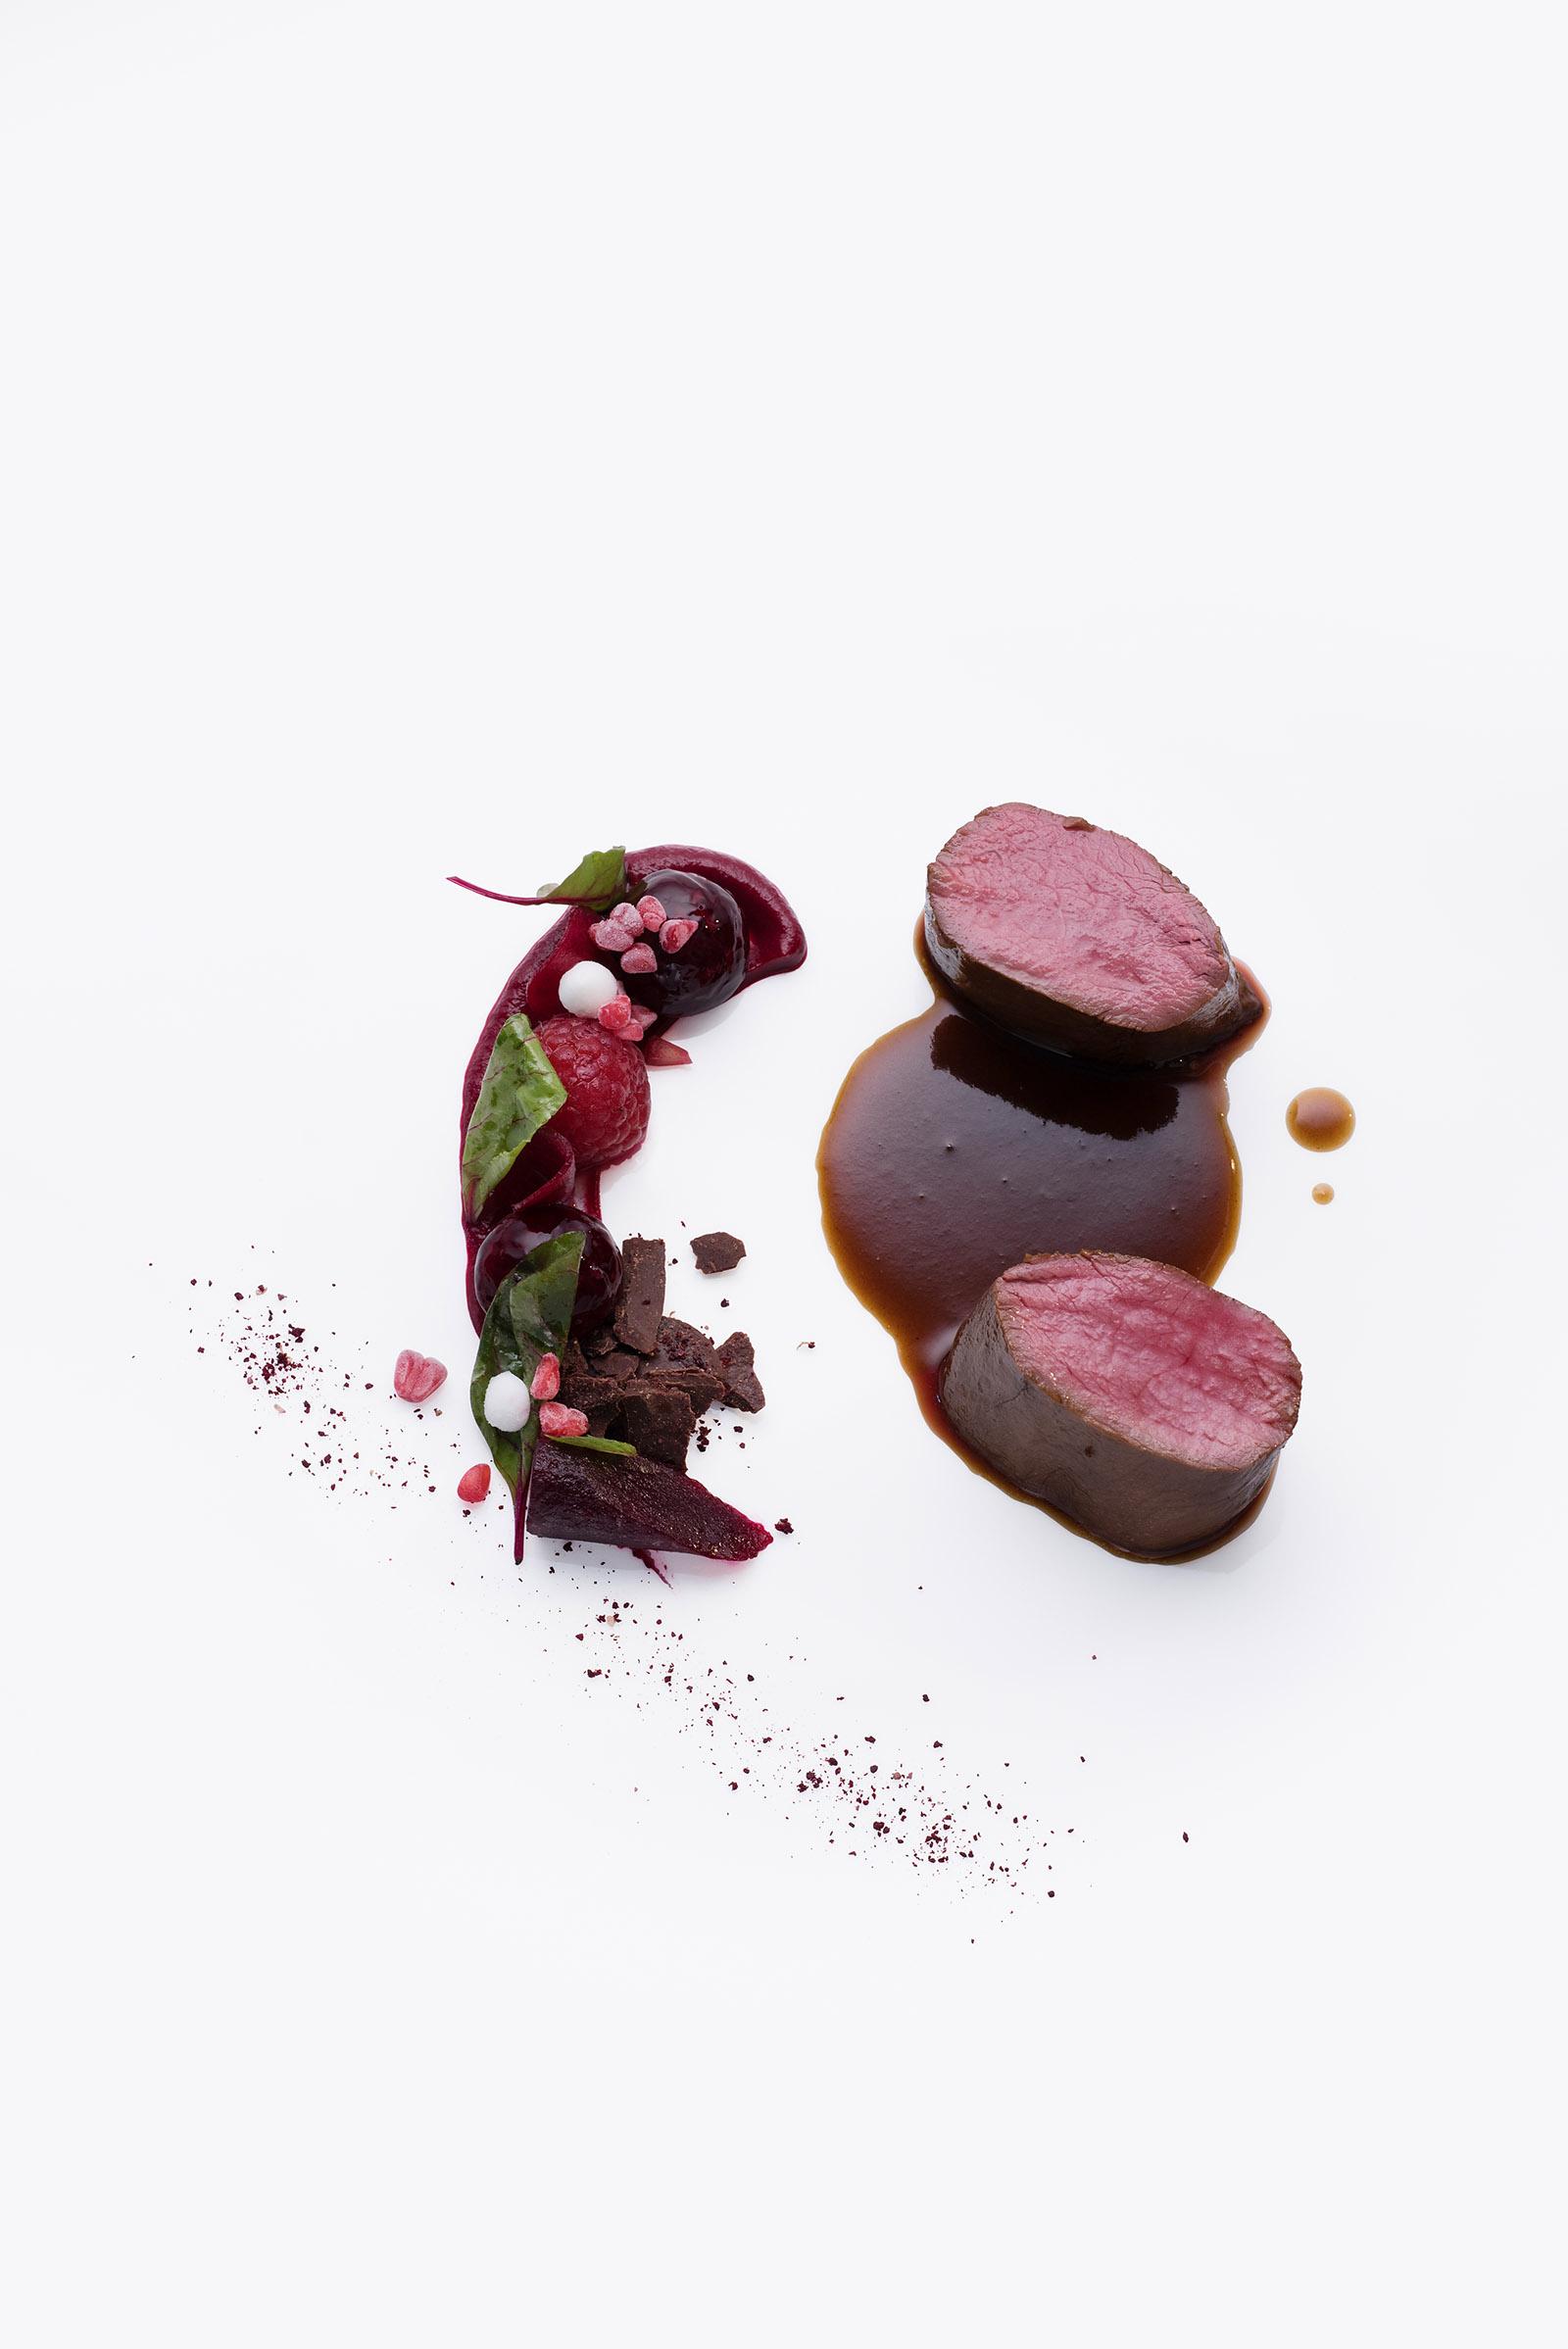 Foodfotografie Fotograf Werbefotografie Fotostudio Oberfranken